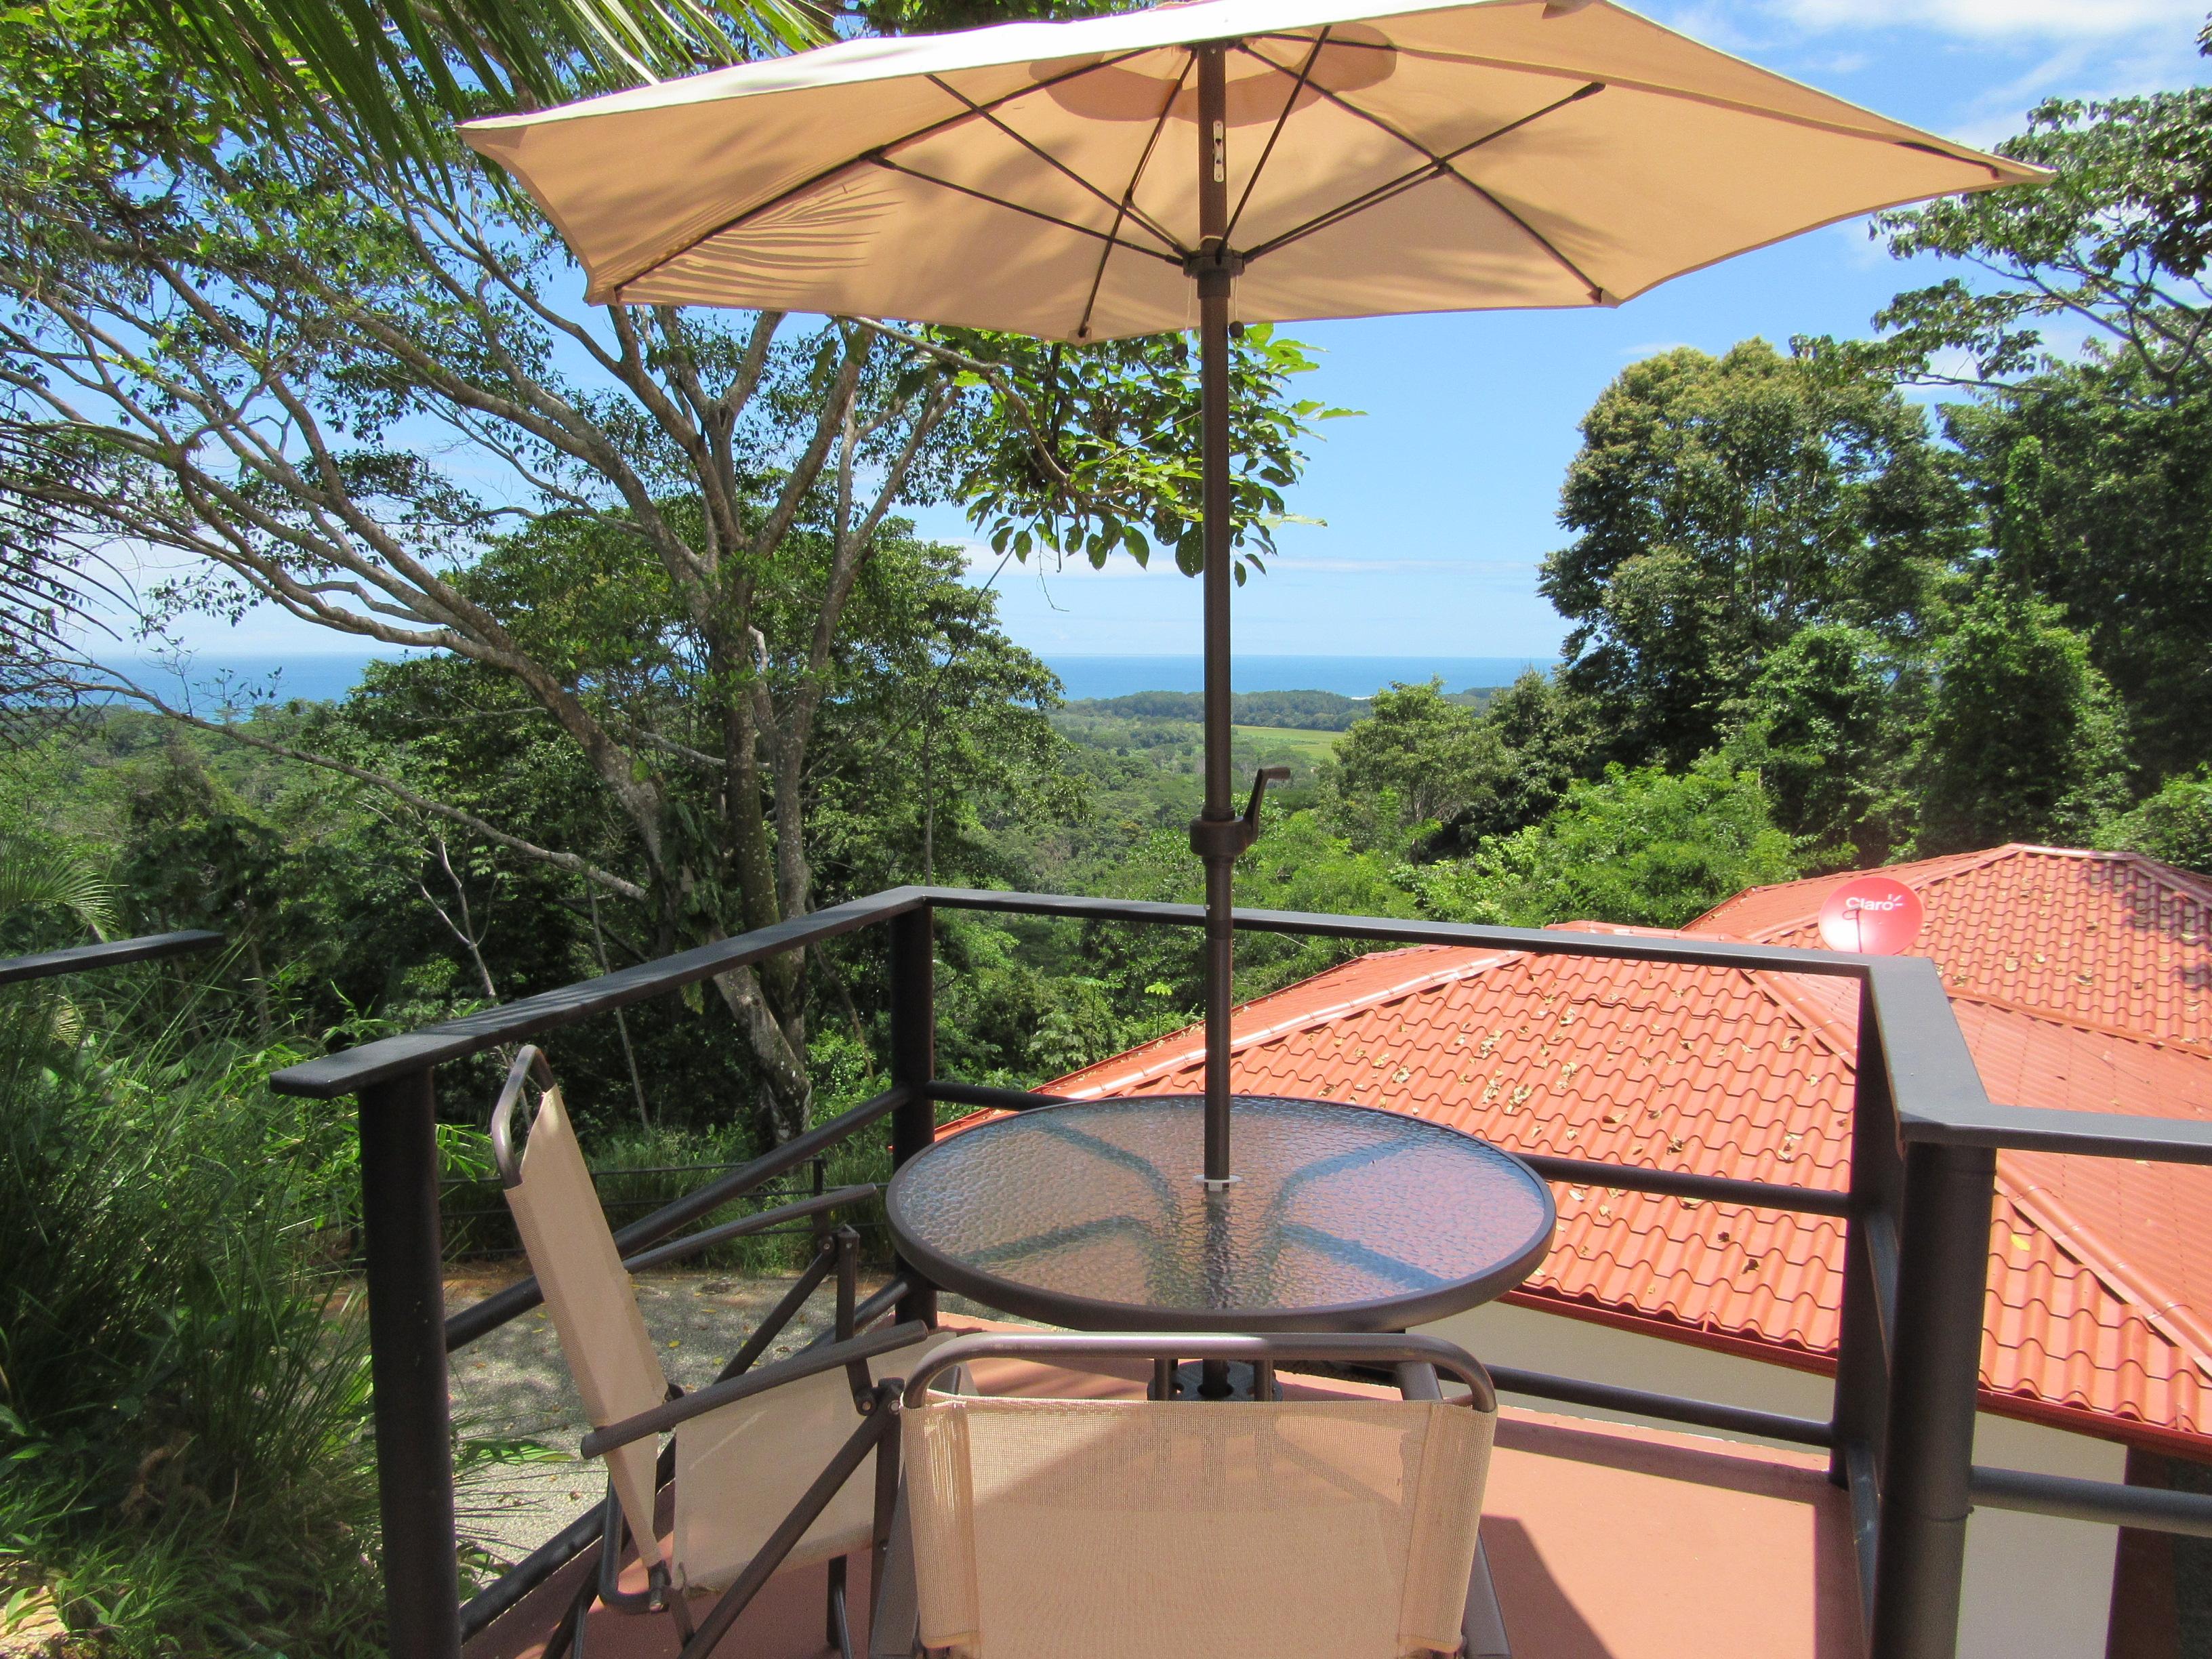 Hatillo-Costa-Rica-property-costaricarealestateHAT087-11.jpg